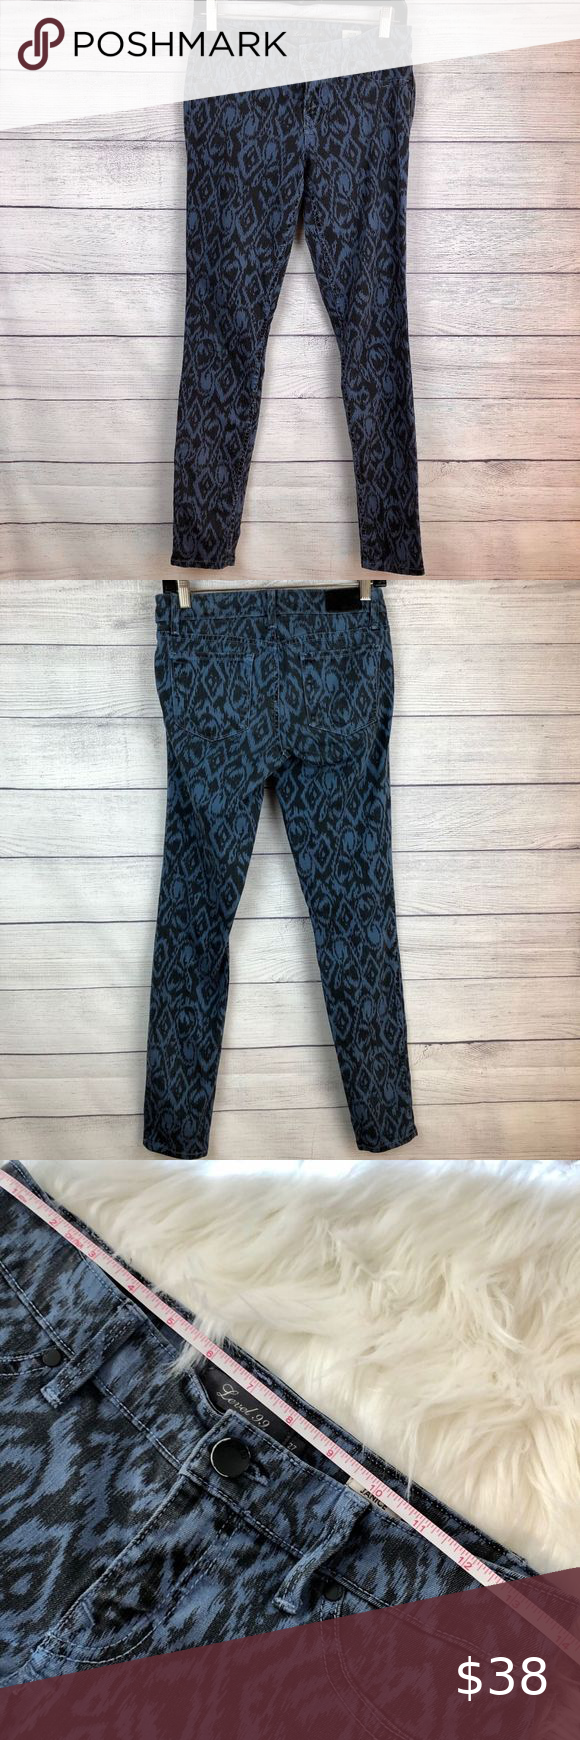 Level 99 Animal Print Black & Blue Jeans 27